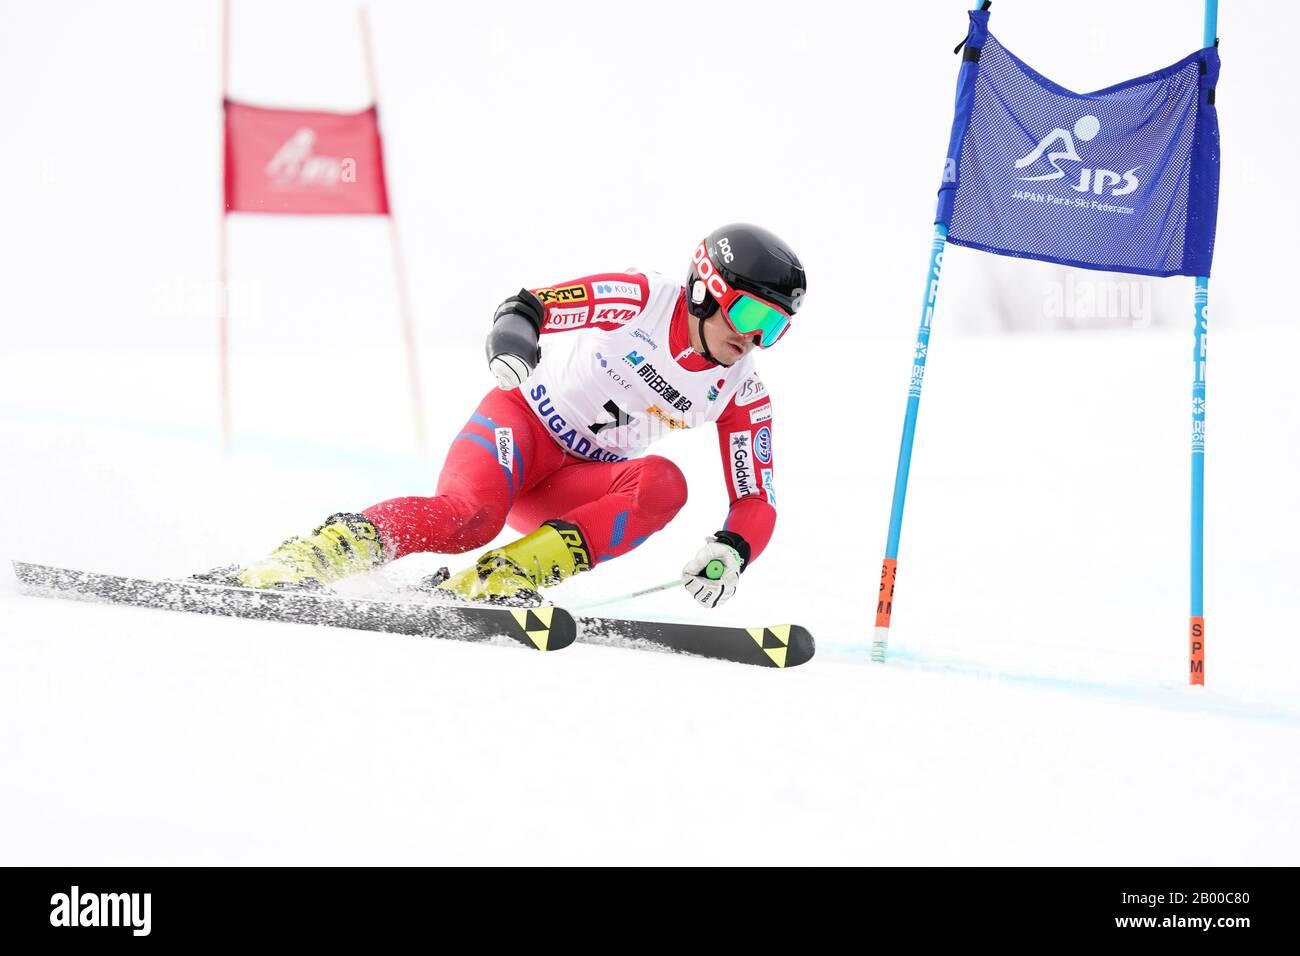 Ueda, Nagano, Japan. 14th Feb, 2020. Kohei Takahashi (JPN), February 14, 2020 - Alpine Skiing : Men's Giant Slalom Standing at Sugadaira Pine Beak during 2020 World Para Alpine Skiing Asia Cup in Ueda, Nagano, Japan. Credit: SportsPressJP/AFLO/Alamy Live News Stock Photo